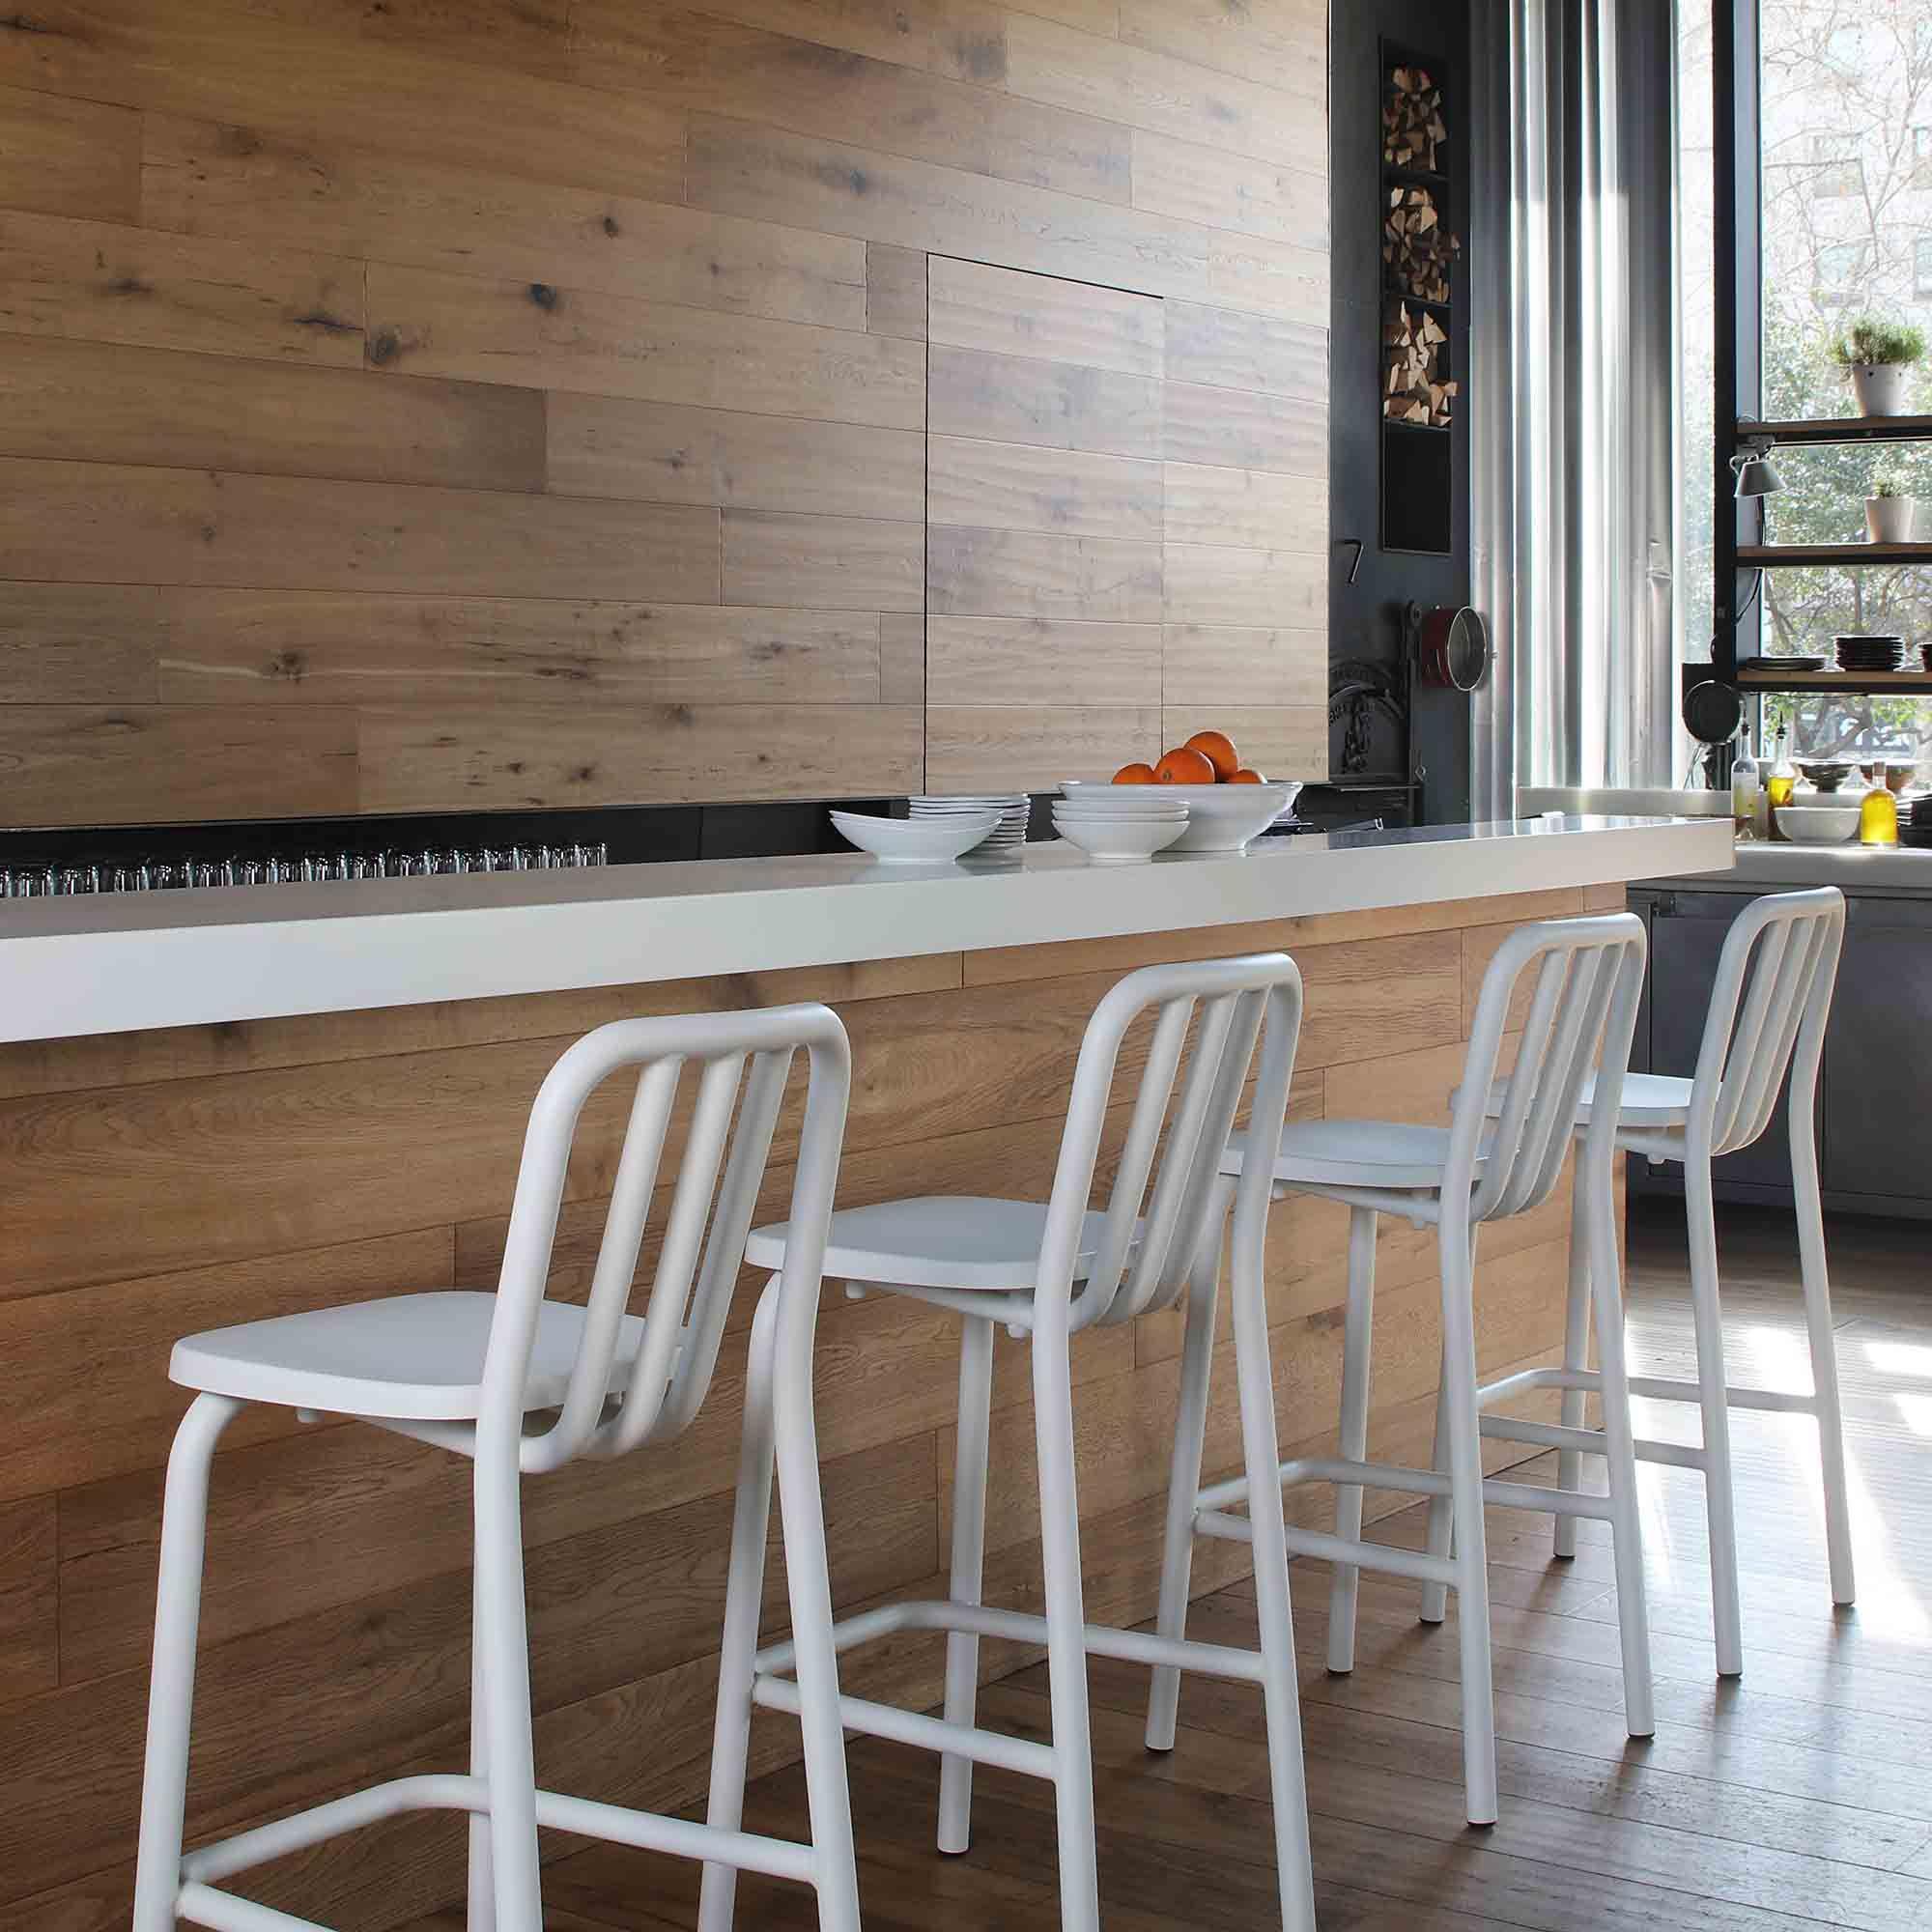 Lubicie klasyczny design Aino Aalto 1937 rok i nadal w ofercie firmy Artek design artek vitra Design dla domu meble T3 Atelier